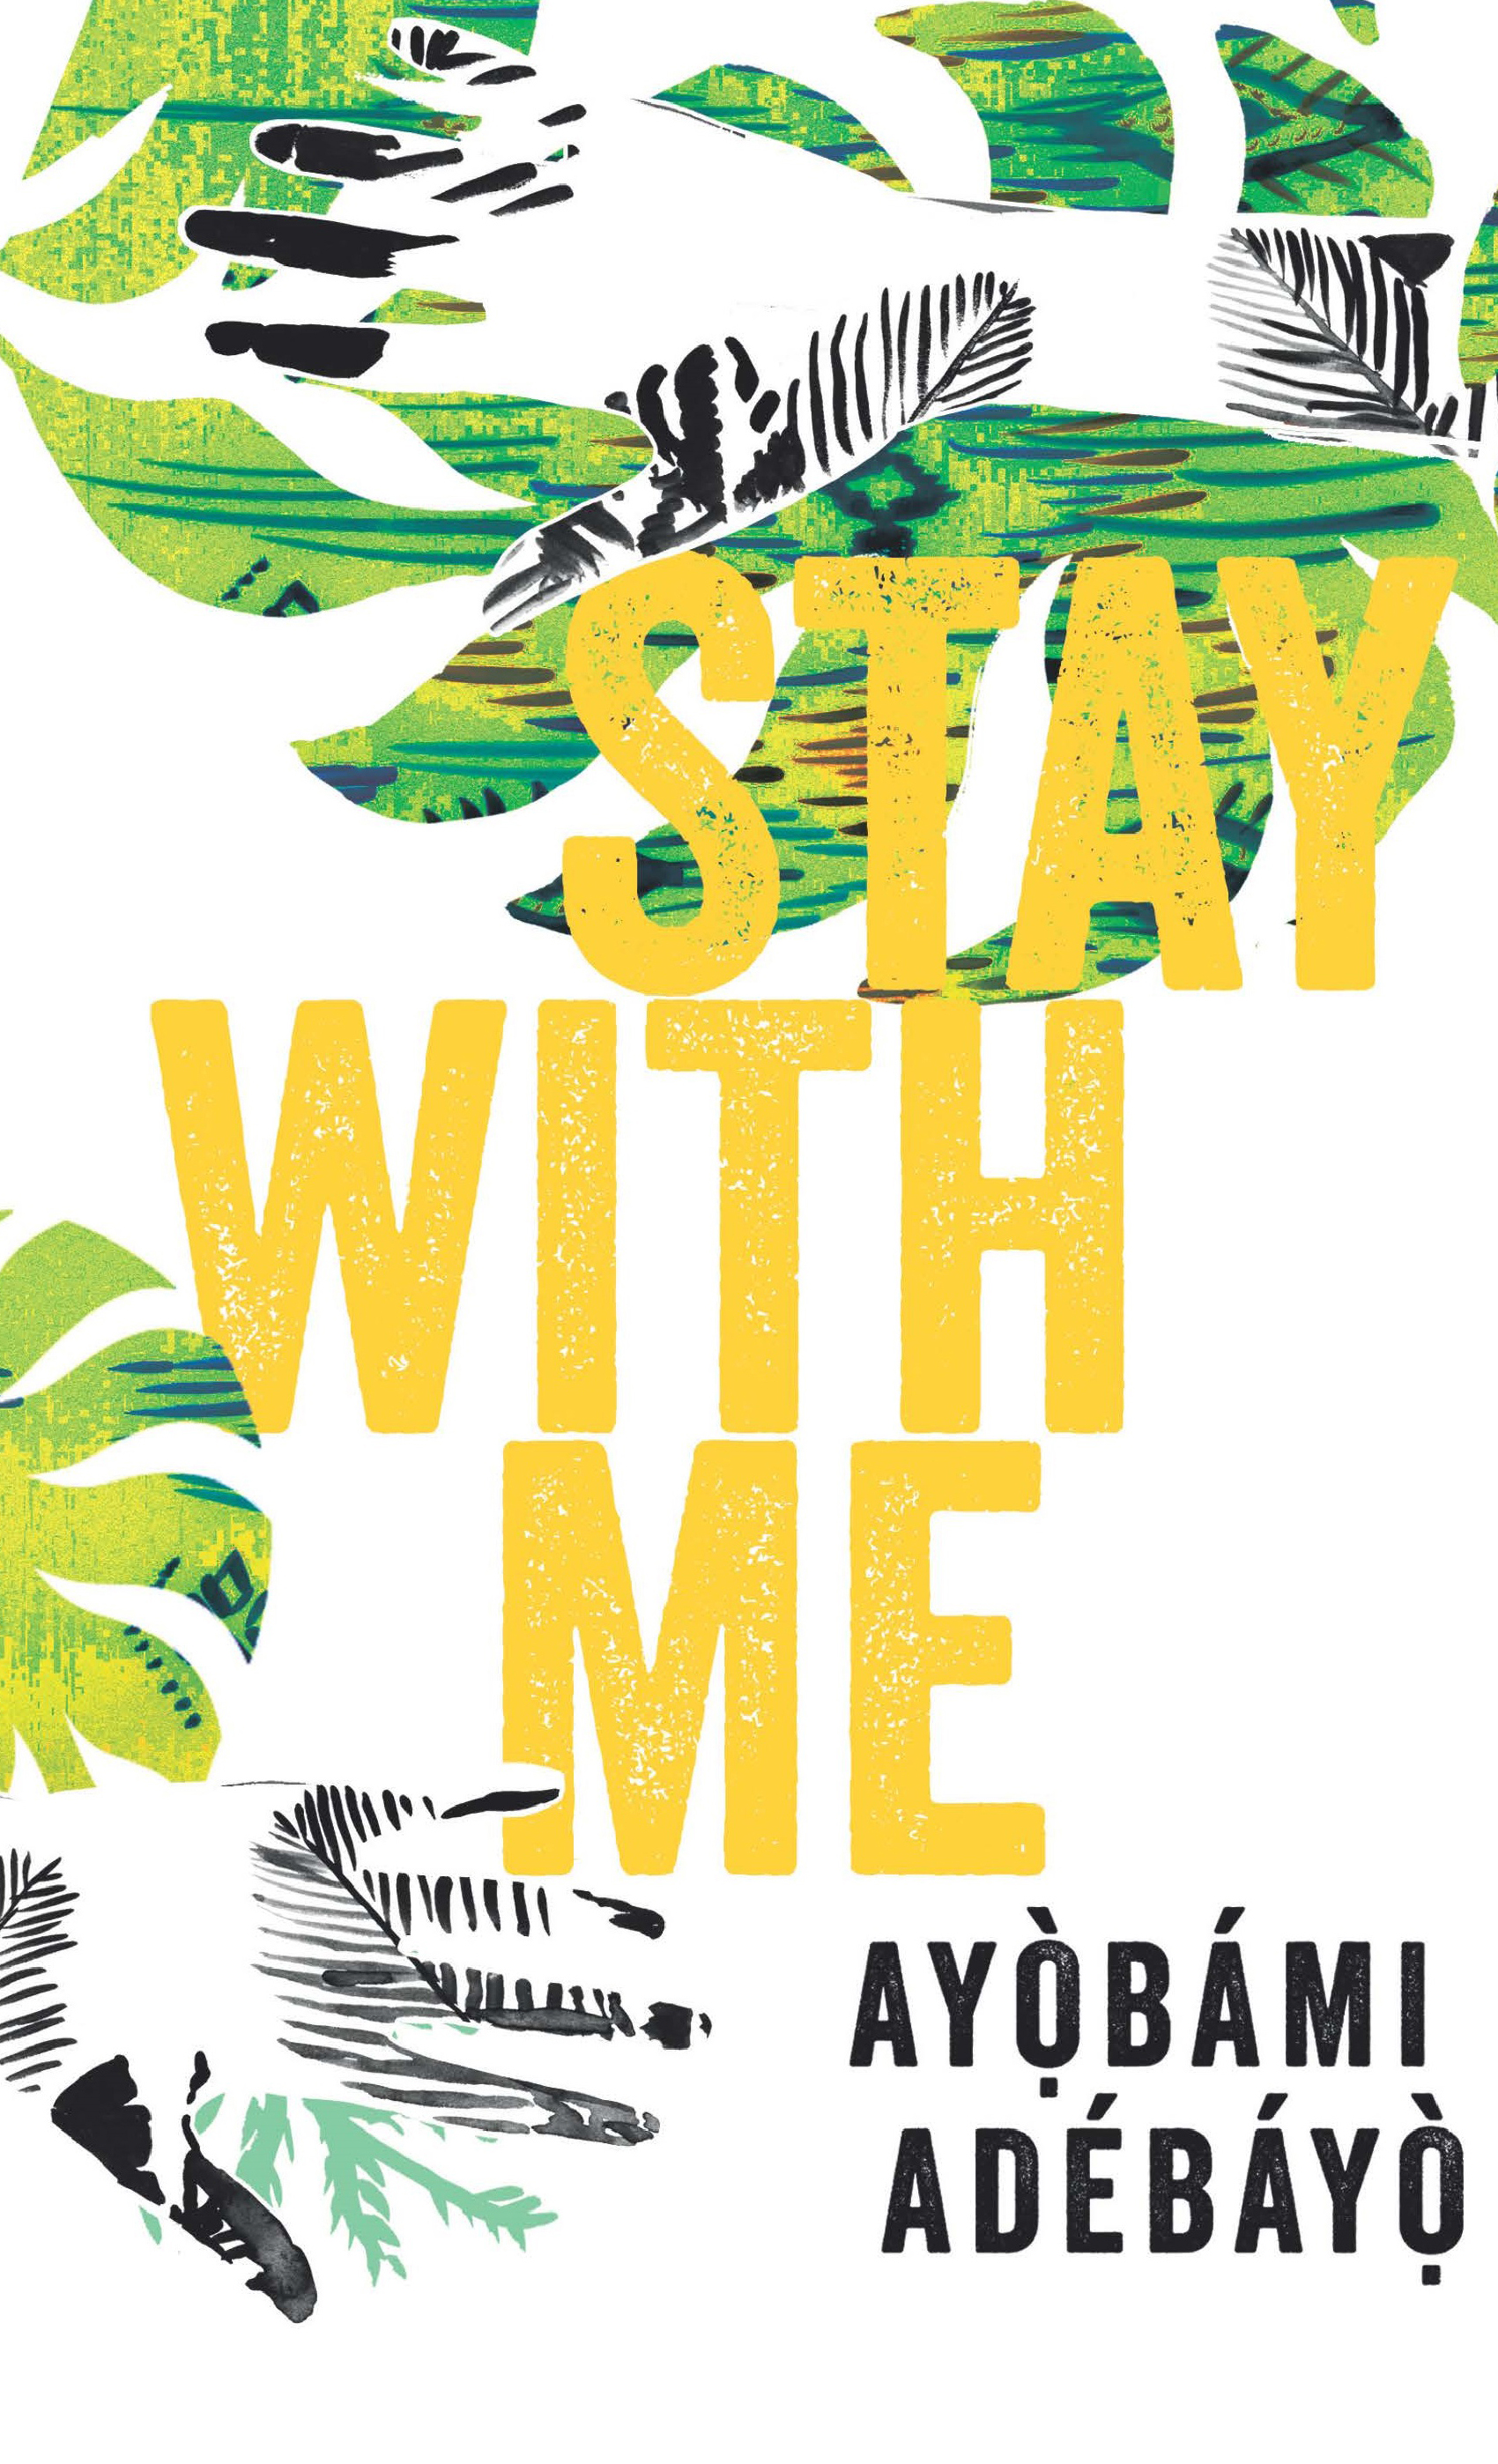 Design: Rafaela Romaya